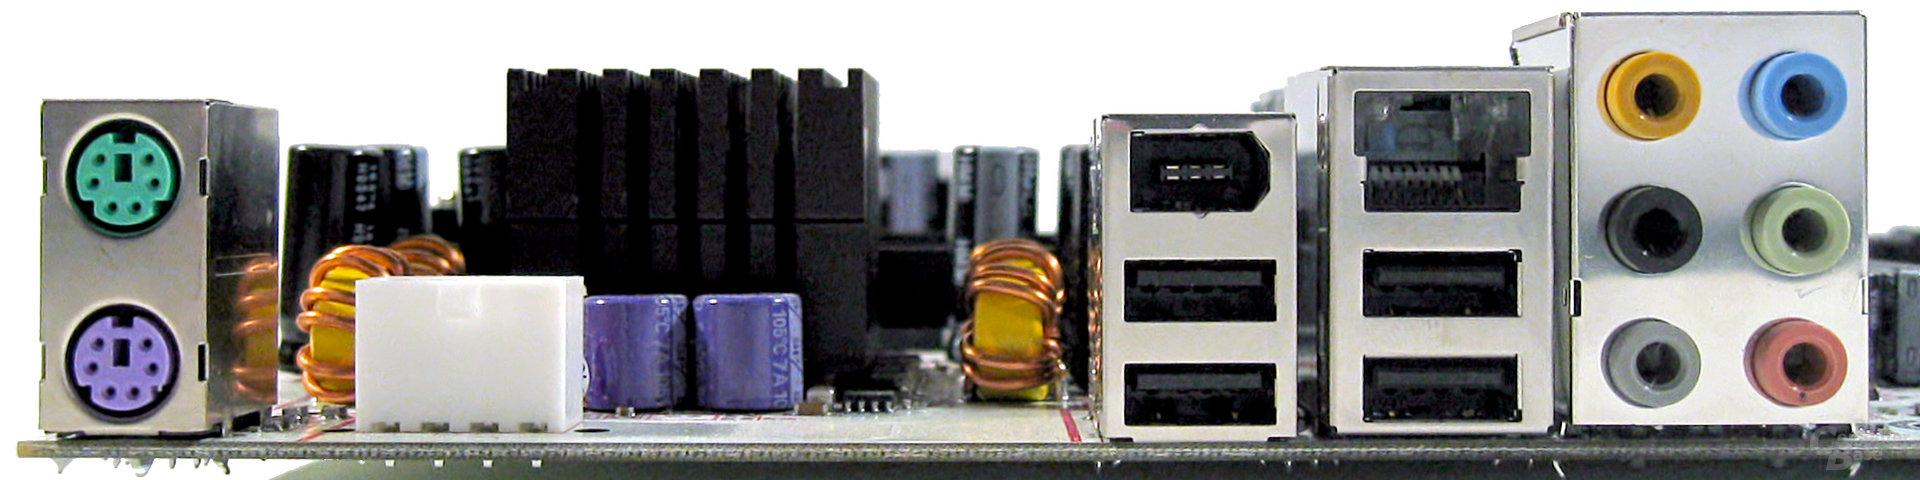 PC-A9RD580 ATX-Blende